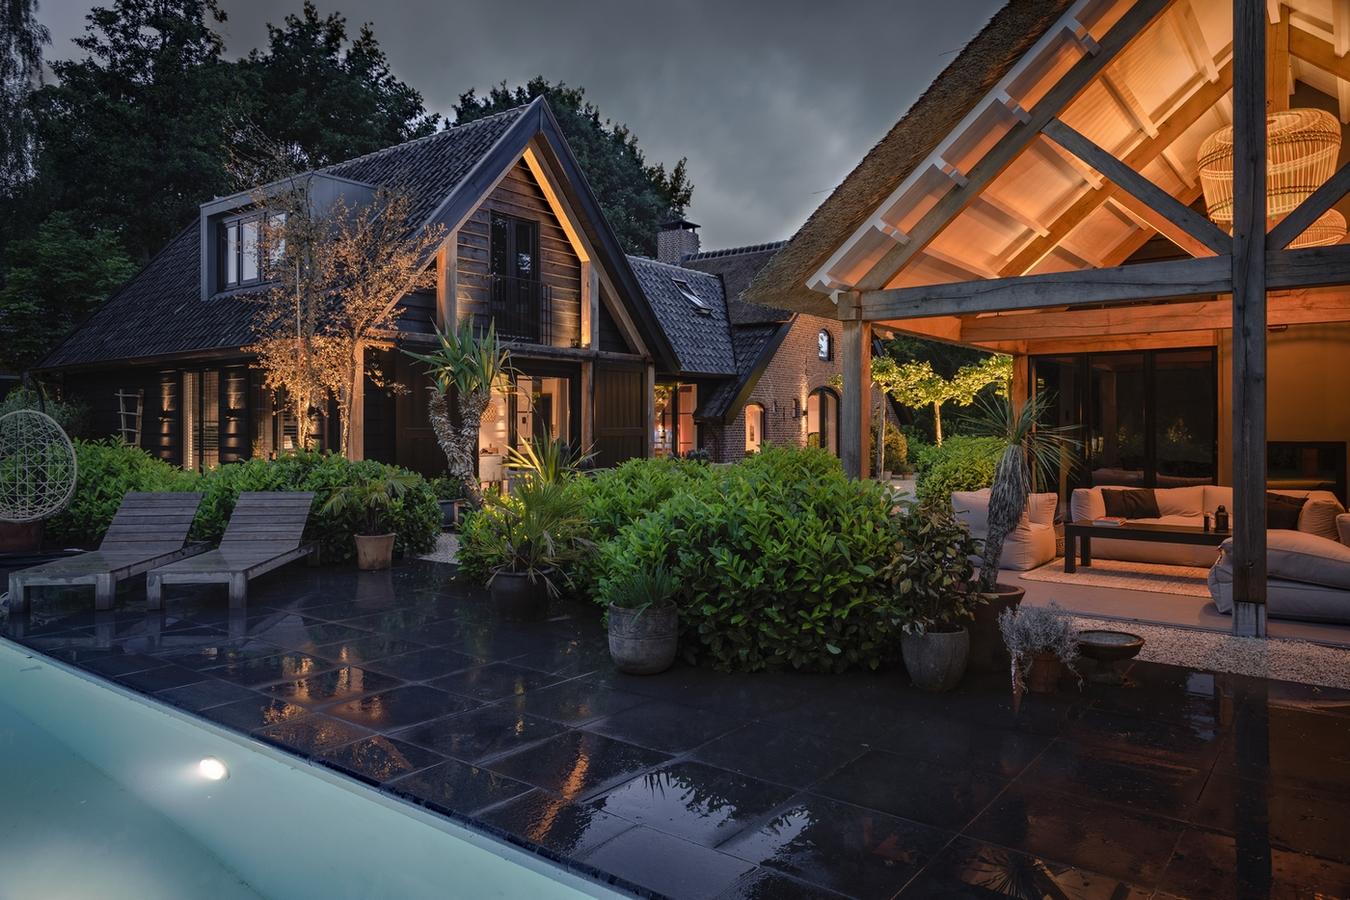 Welson maatwerk zwembad in verlichte tuin